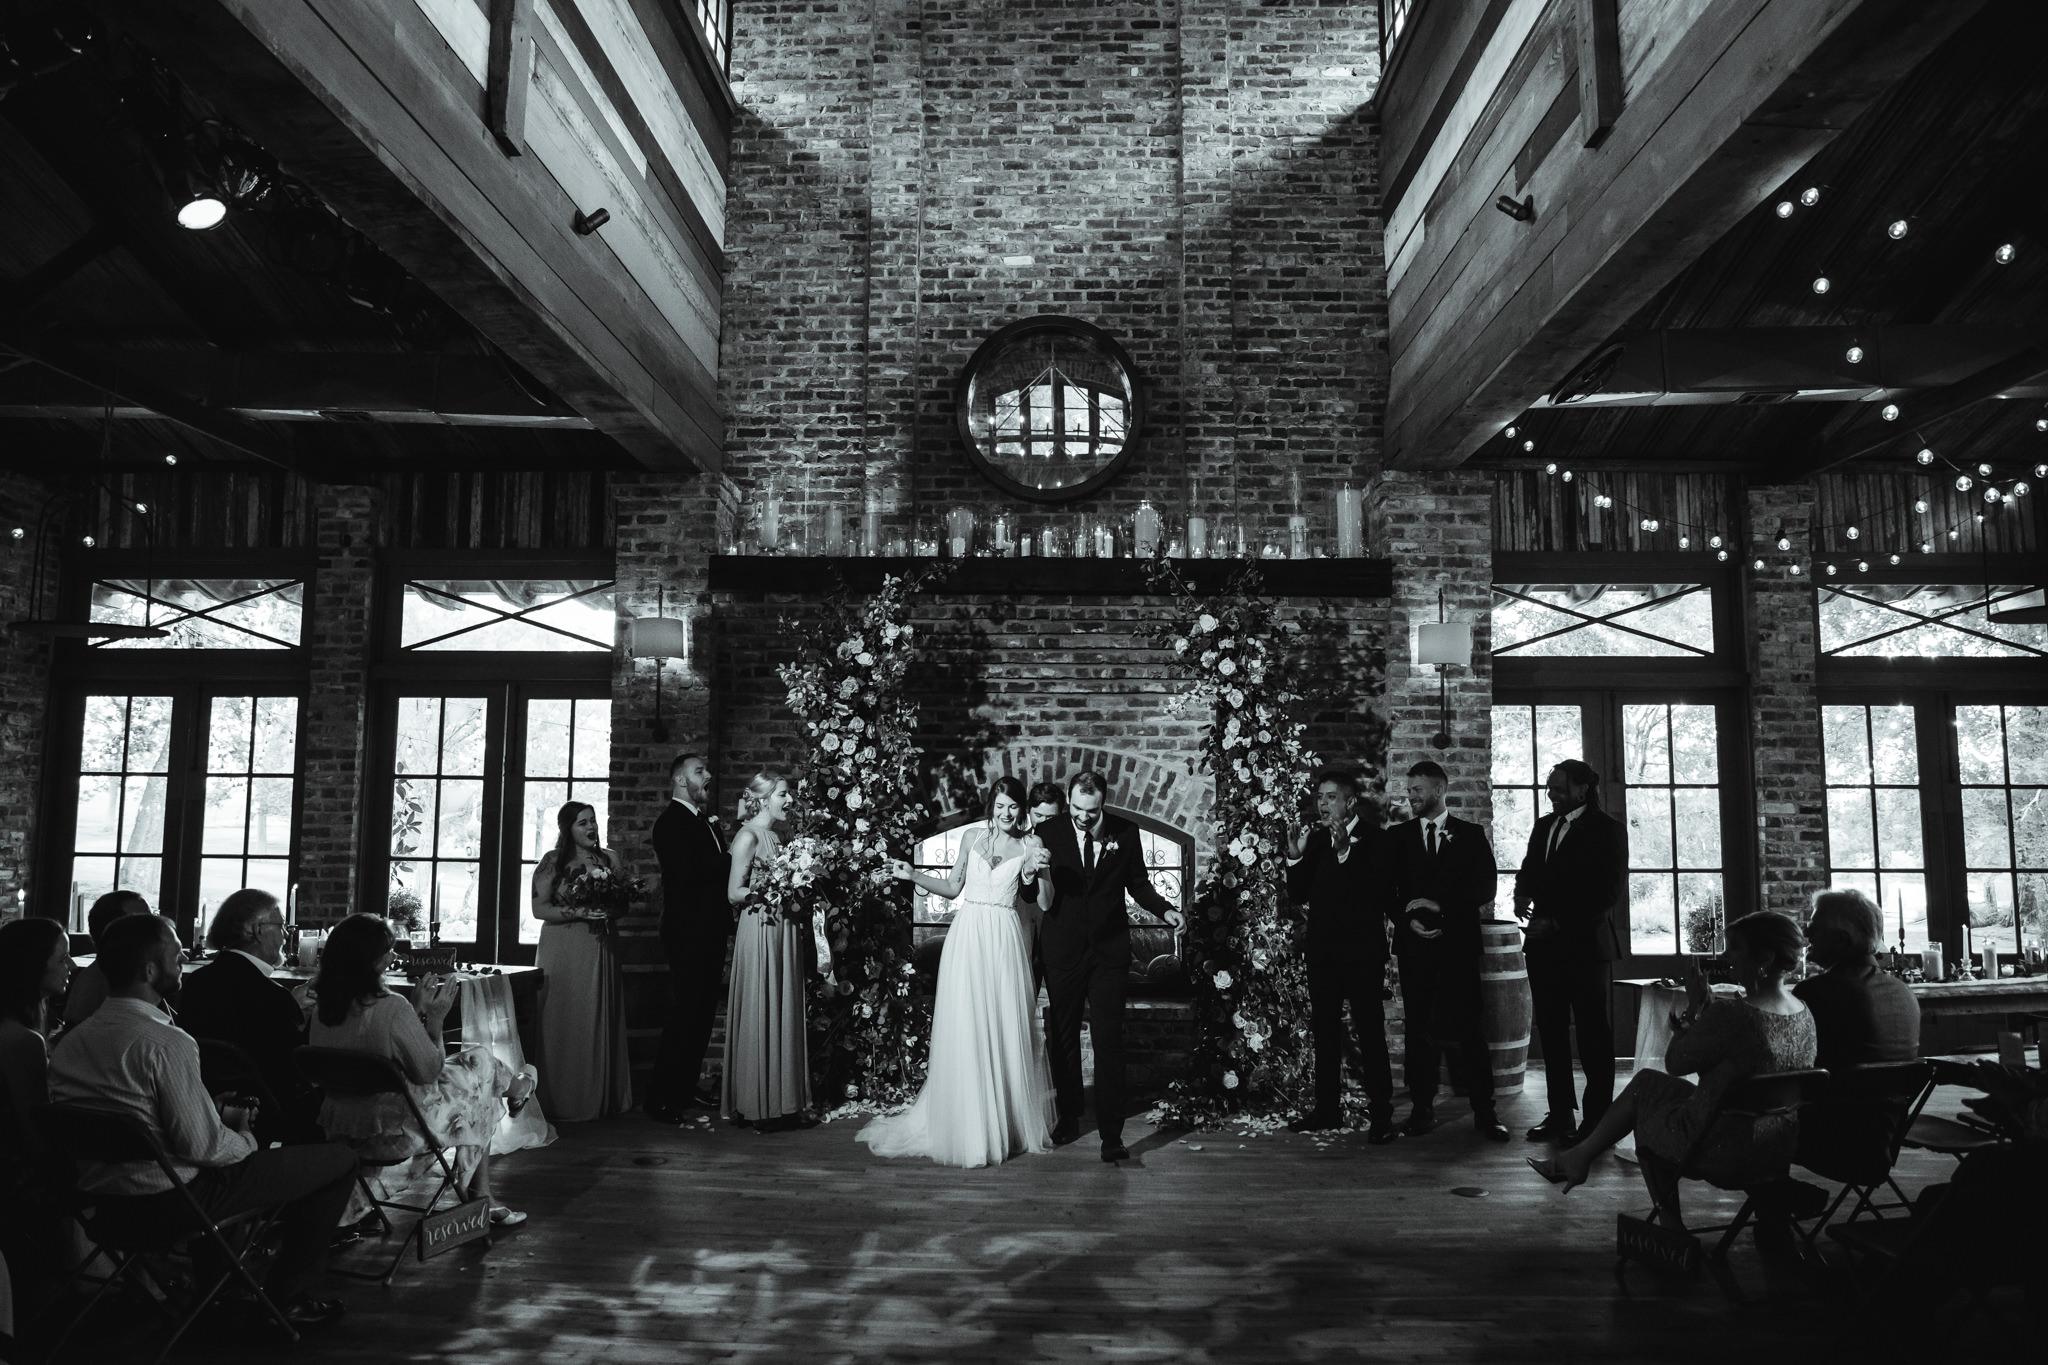 phantom-canyon-brewery-colorado-springs-wedding-photographer-404.jpg